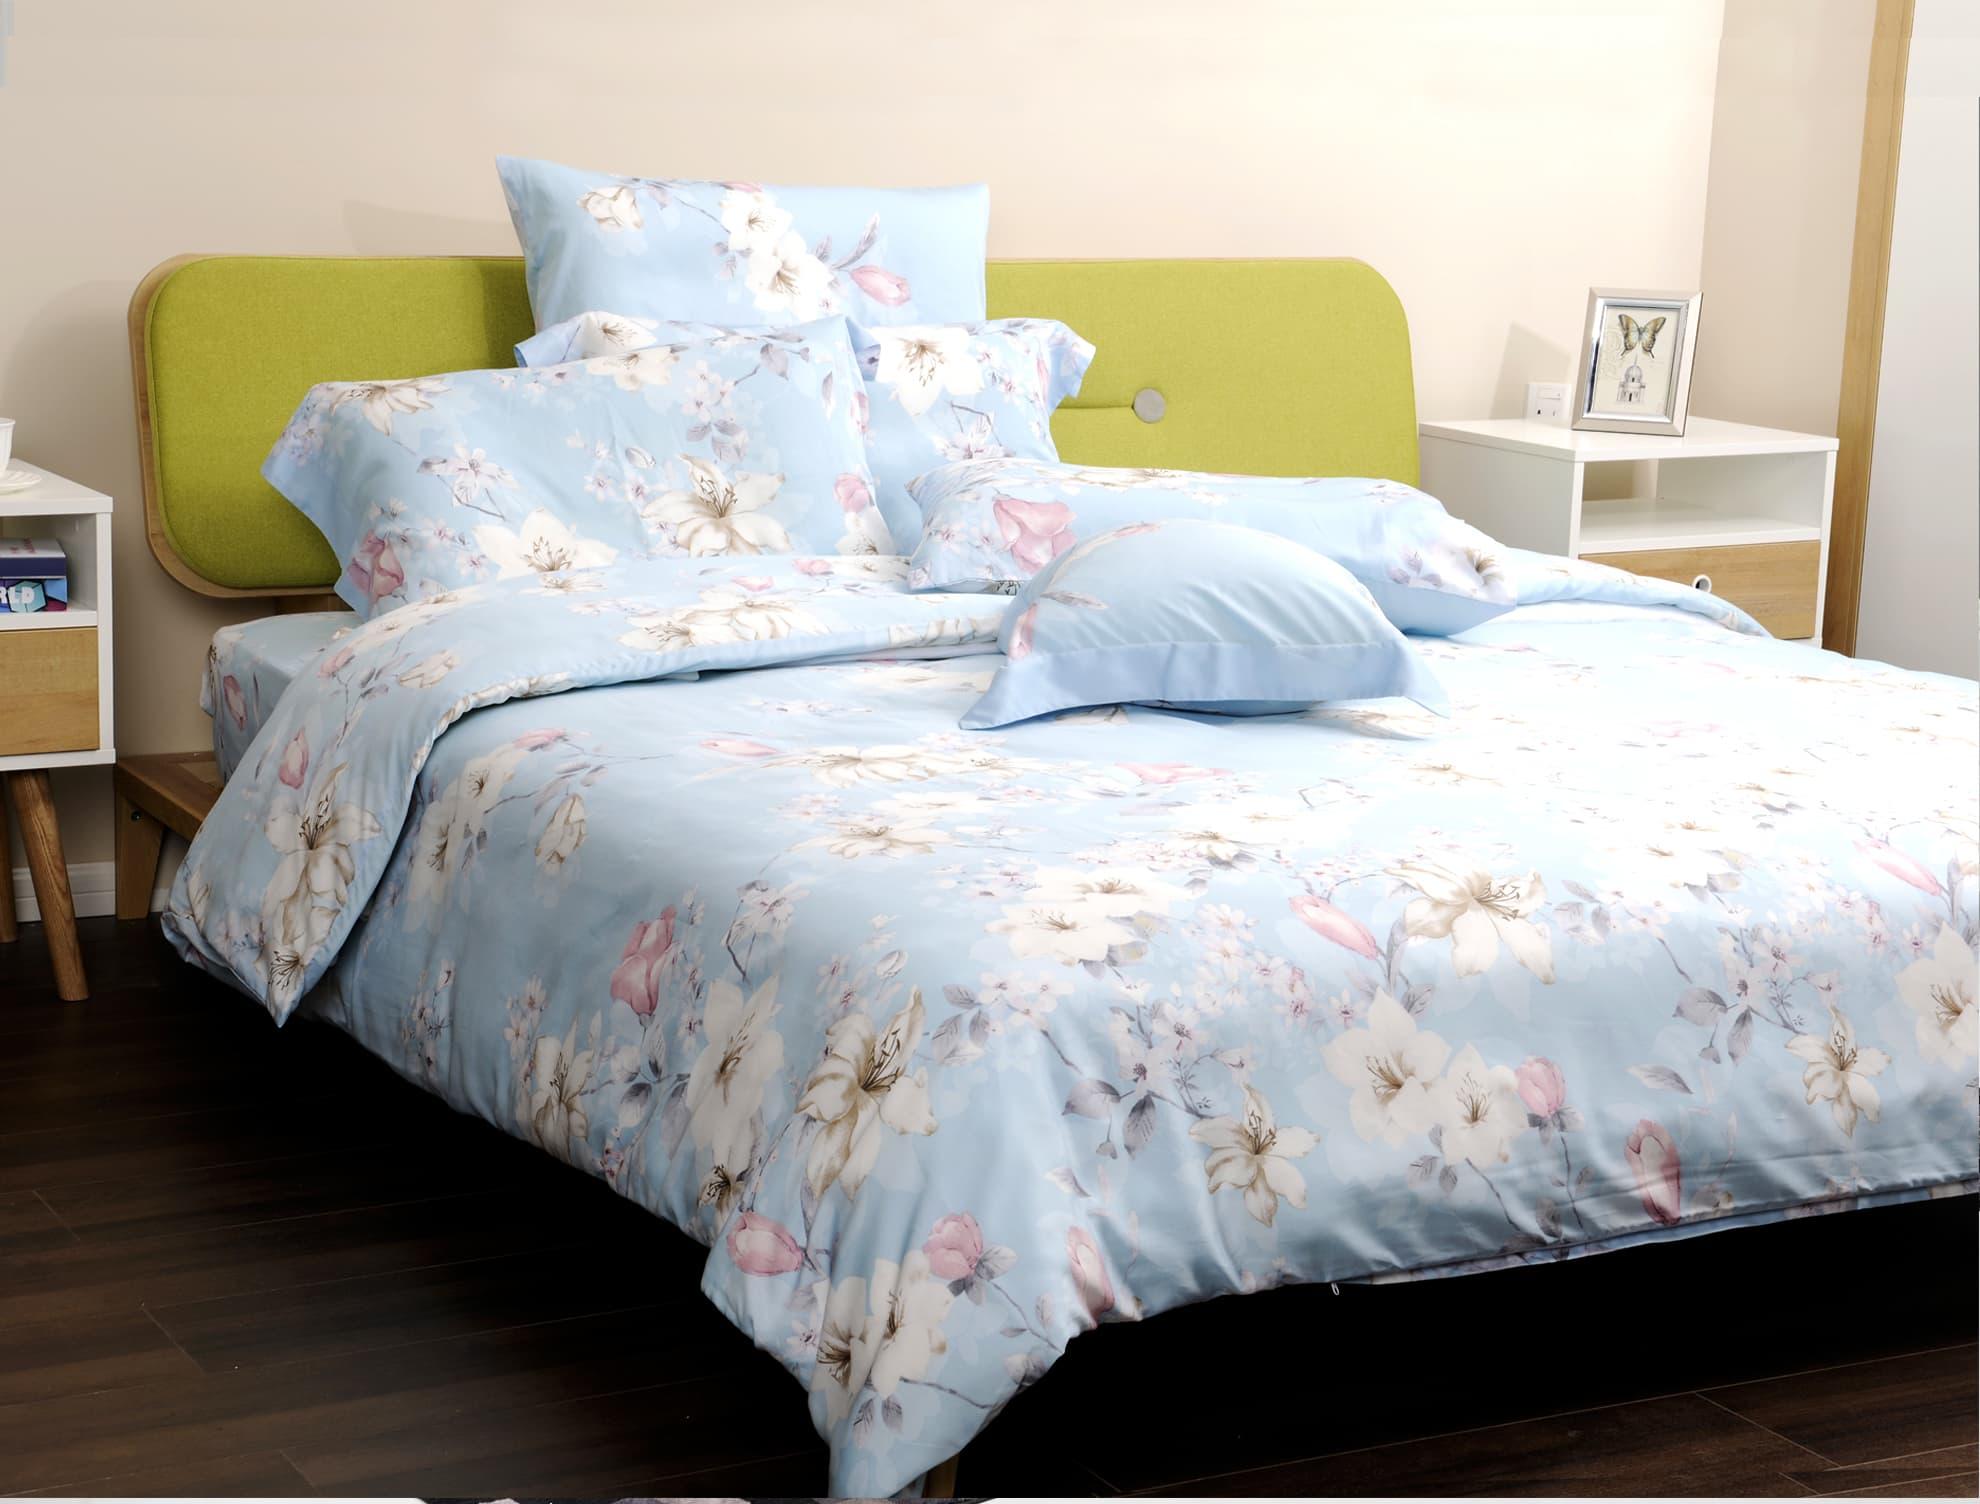 bedding_4